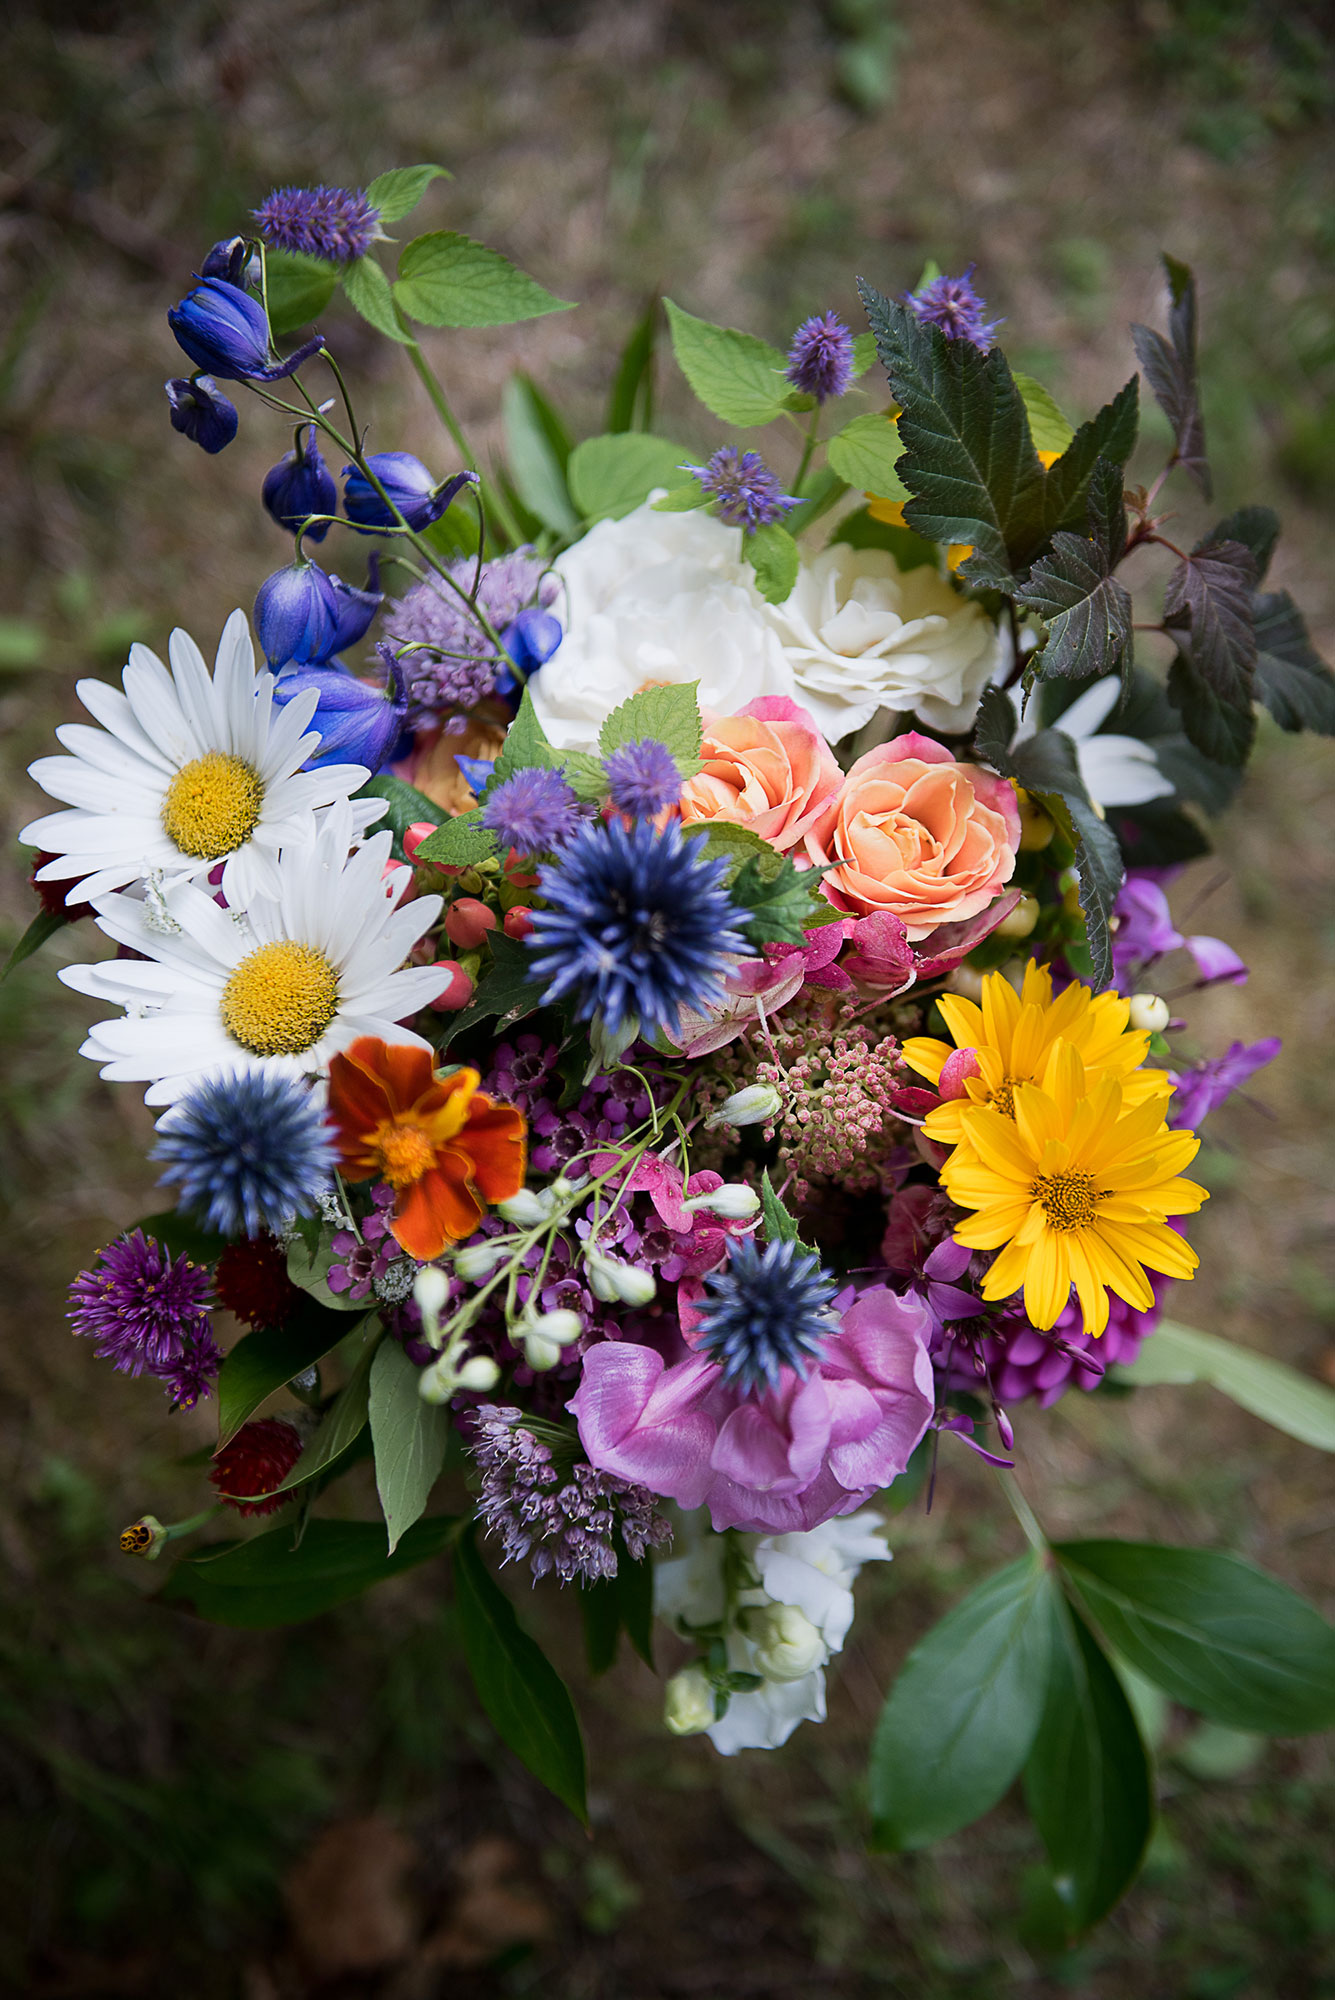 rose_bee_balm_black_eyed_susan_daisies_wedding_bouquet_perennia.jpg